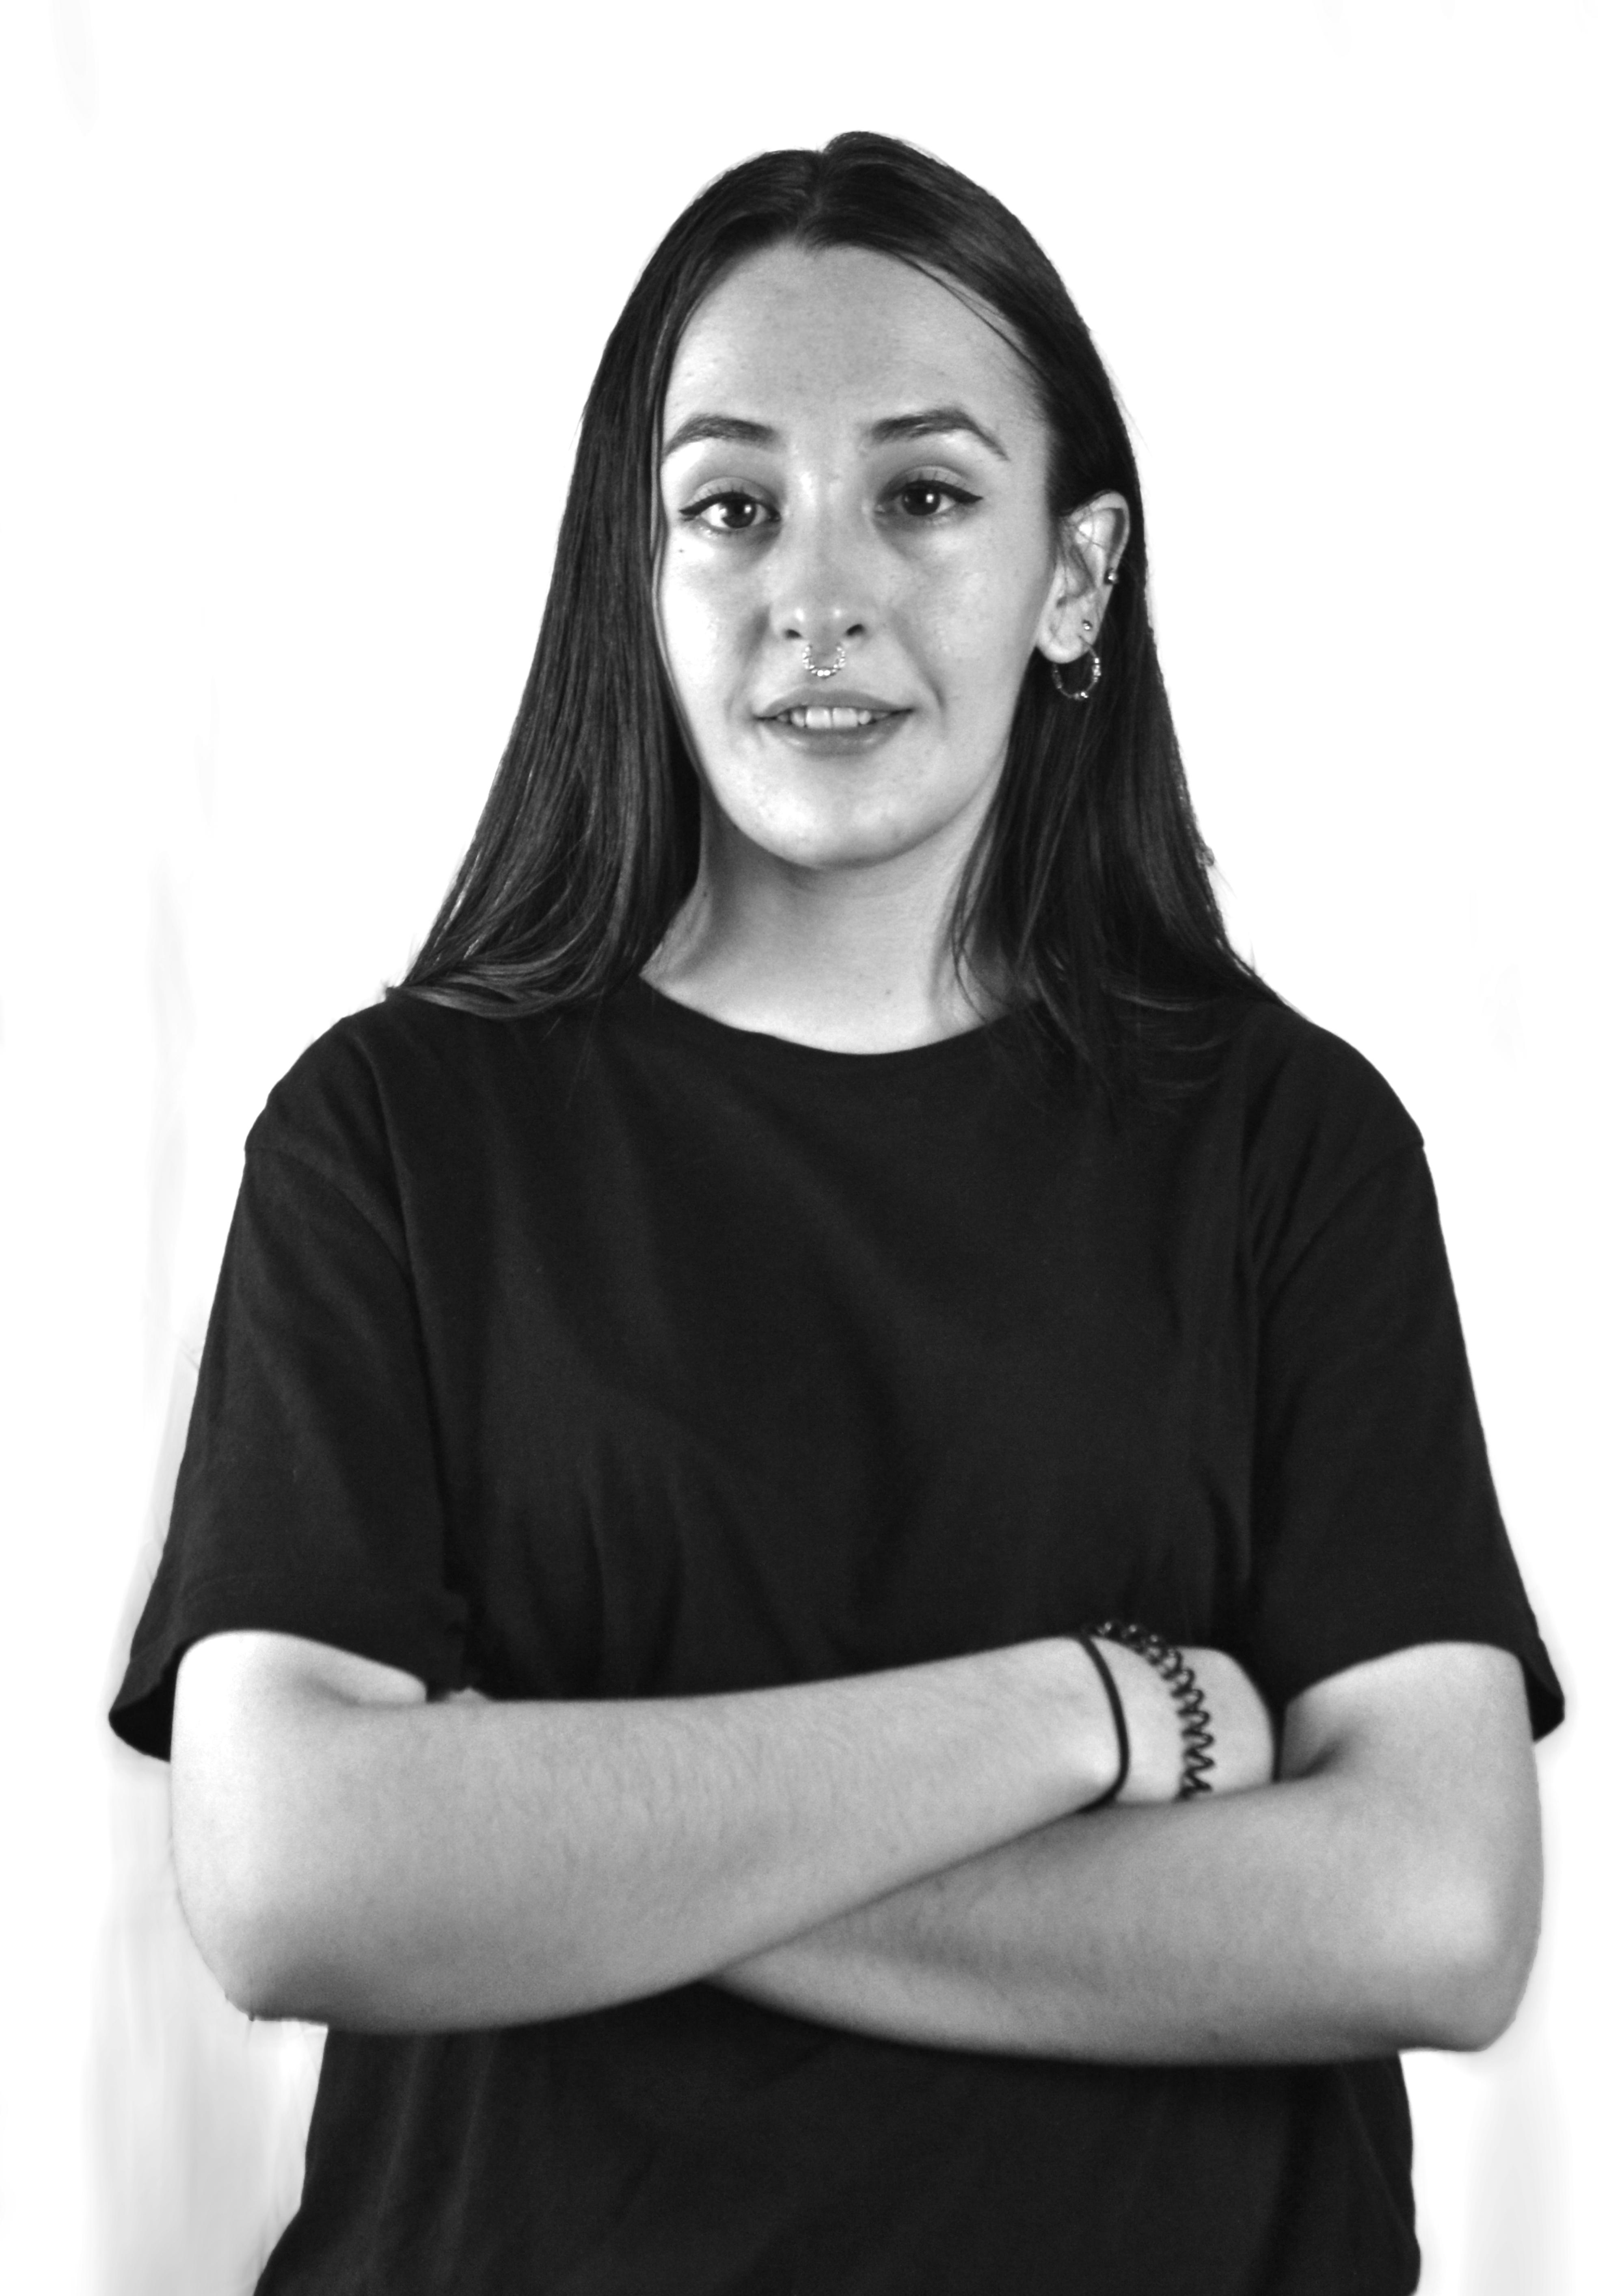 ALEJANDRA MARÍN (TORI)